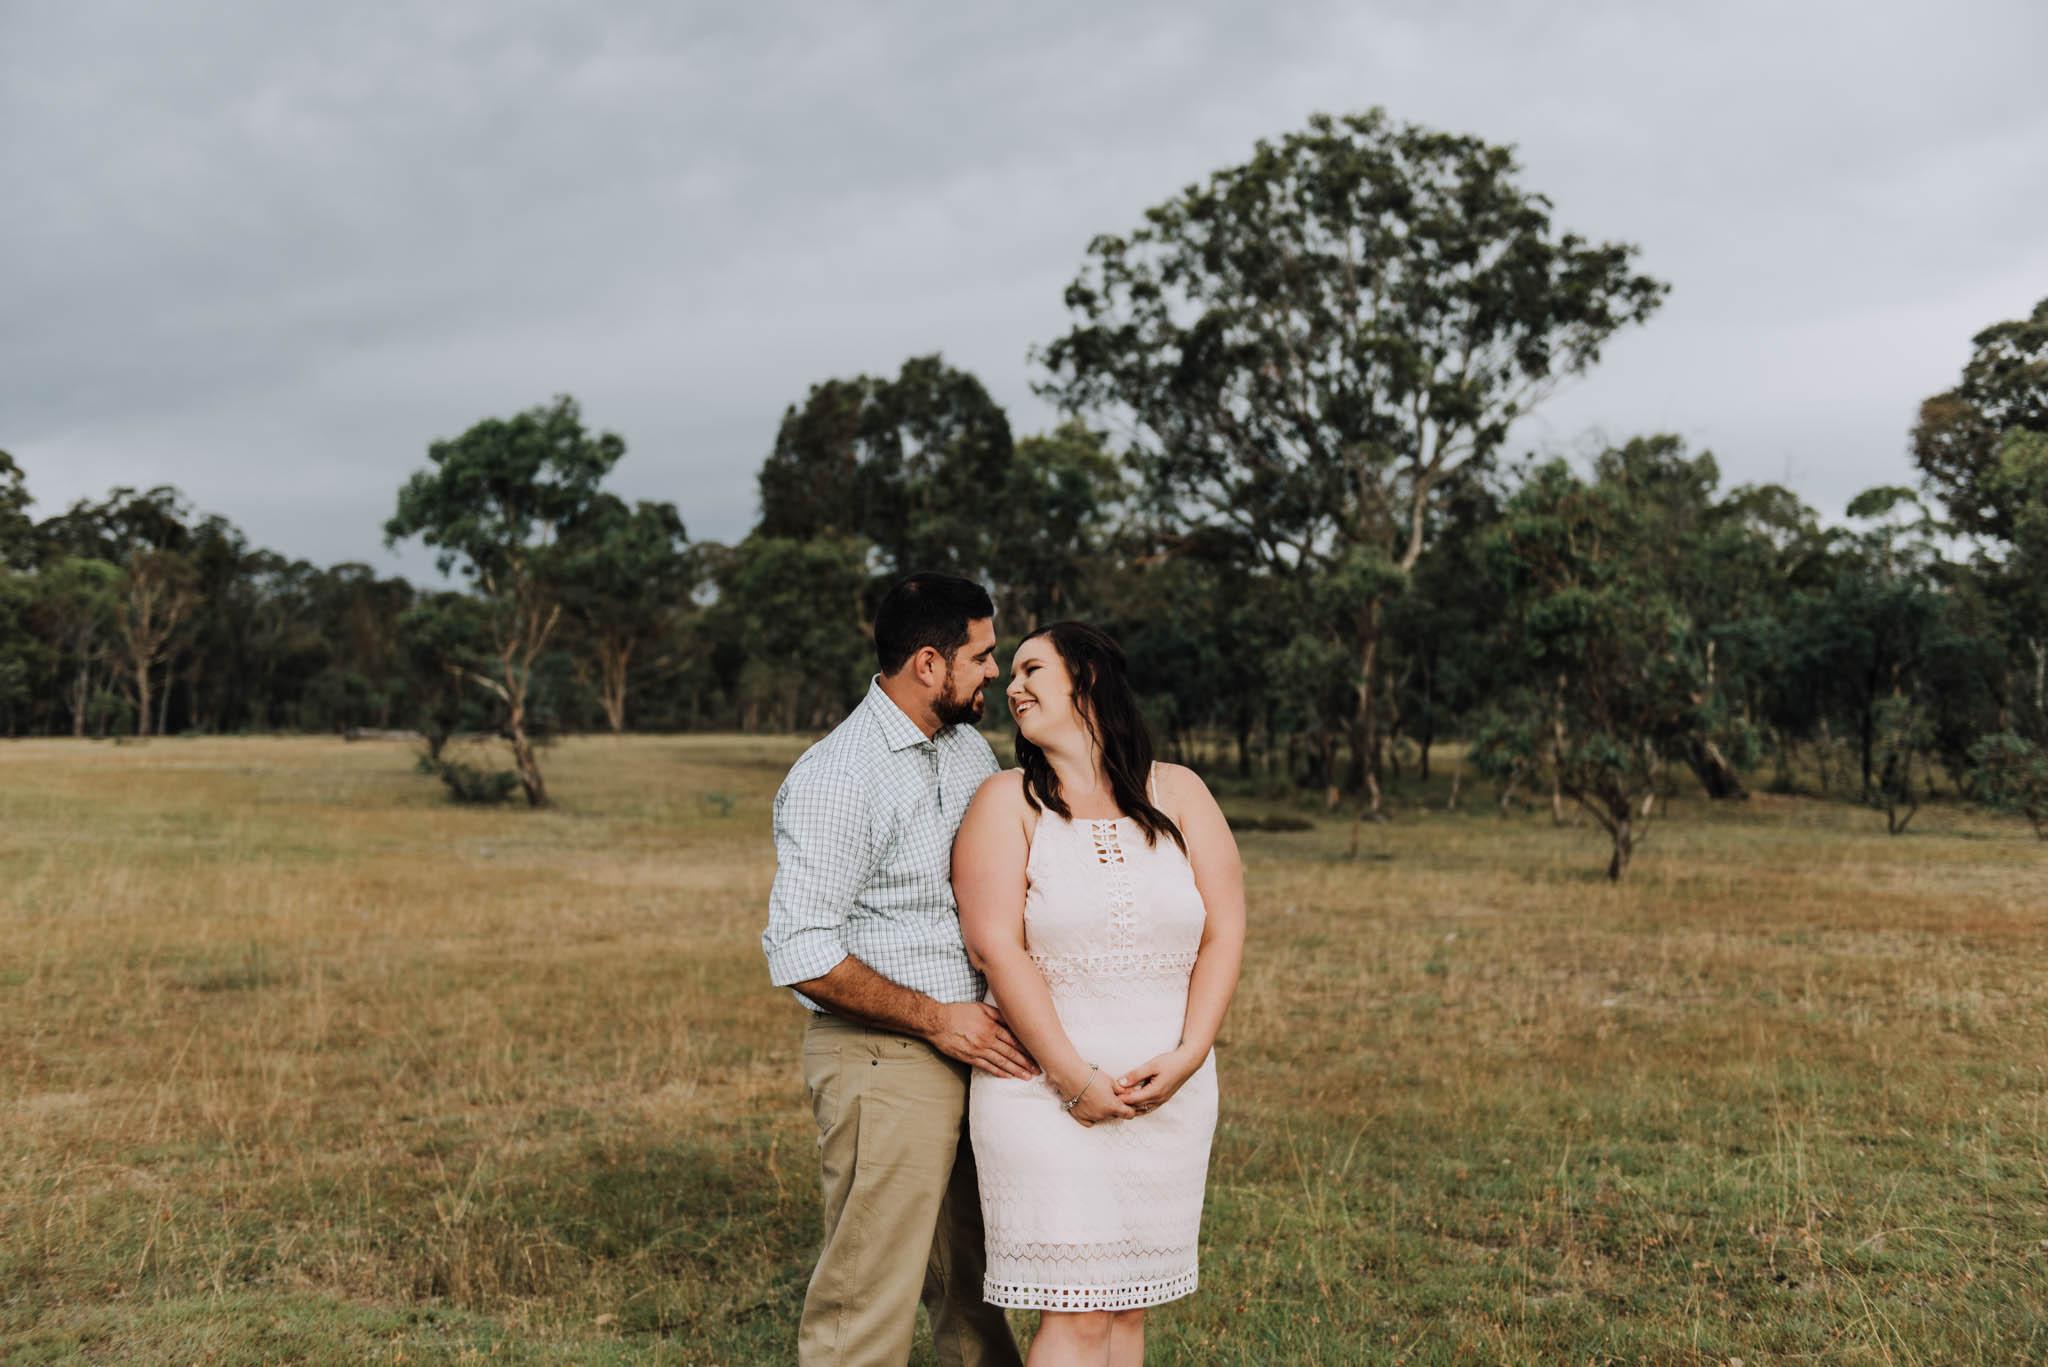 | M + J ENGAGED |CANBERRA - JAN 2018